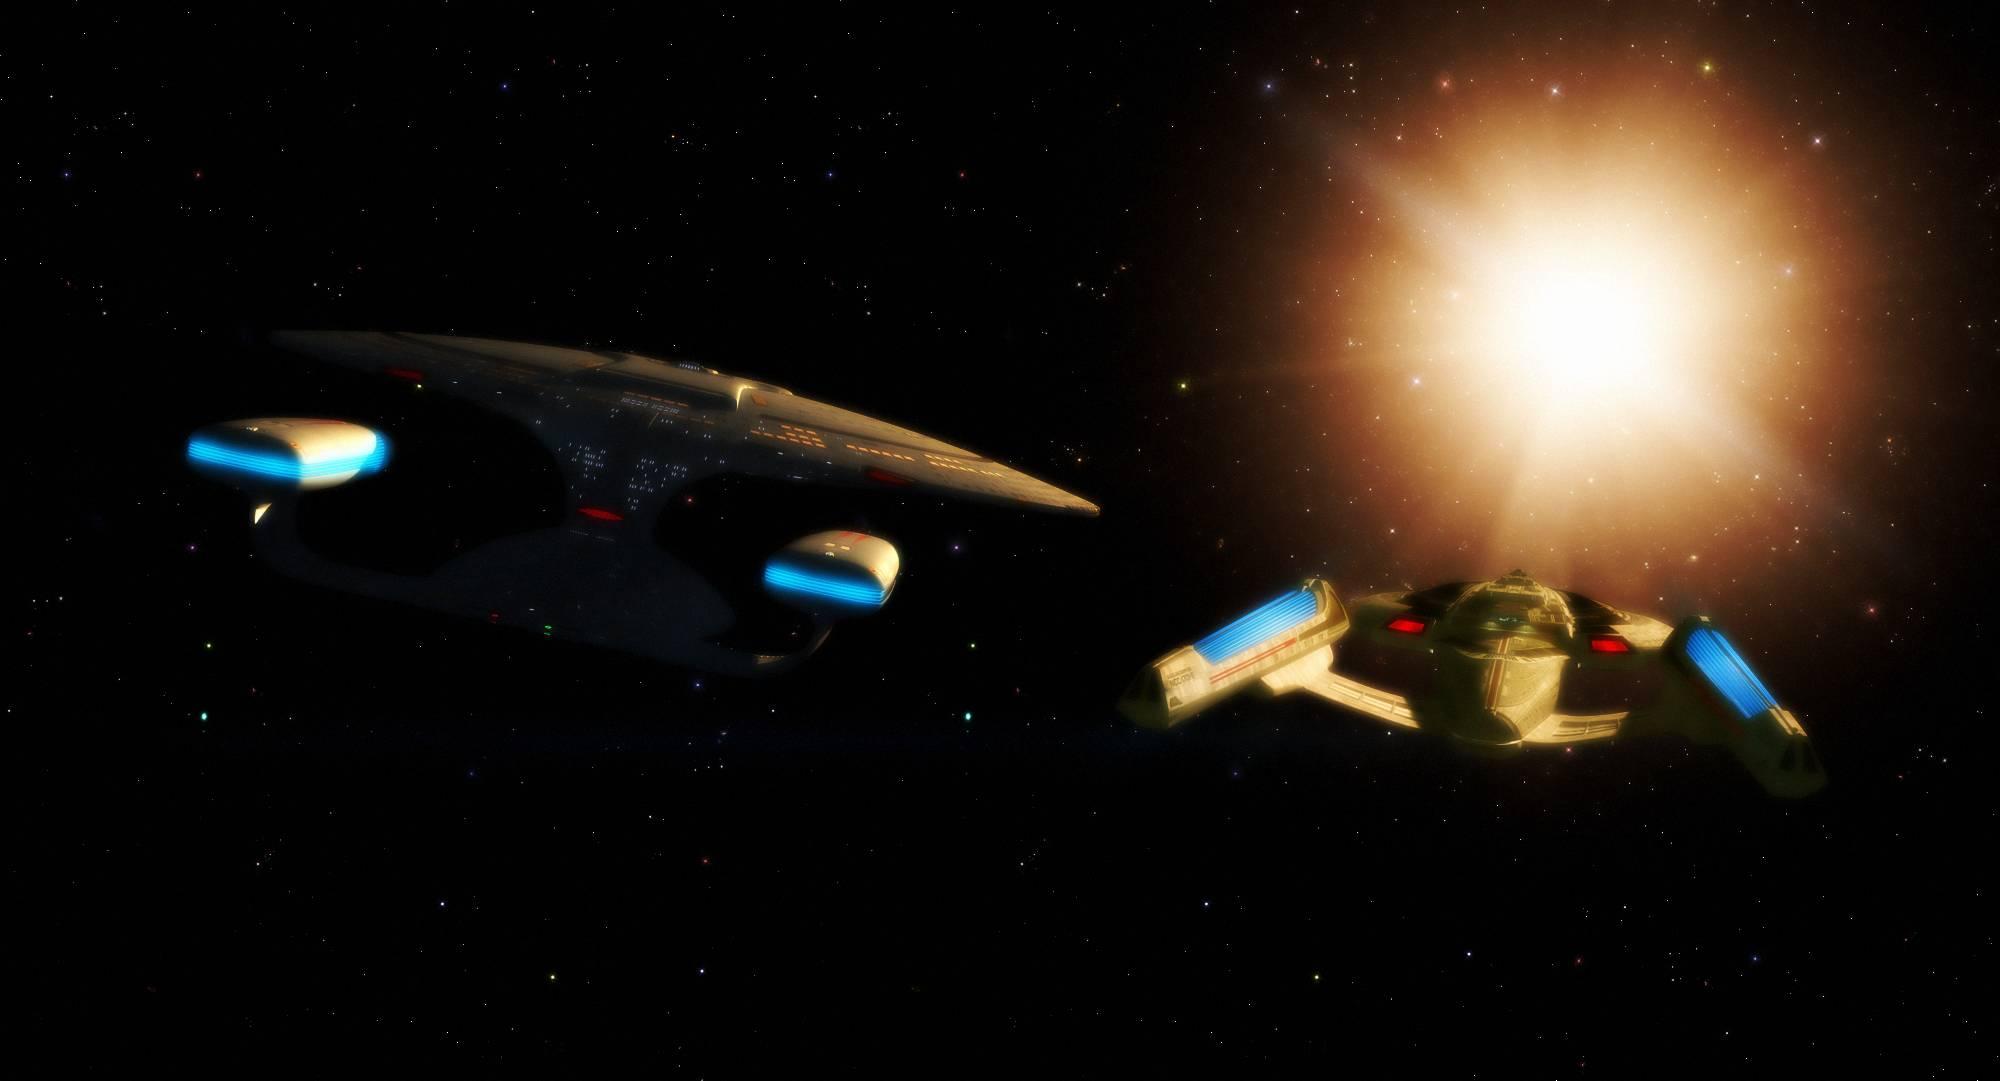 Star Trek Spaceships Uss Enterprise Wallpaper Hq Wallpaper 20192 Car 2000x1081